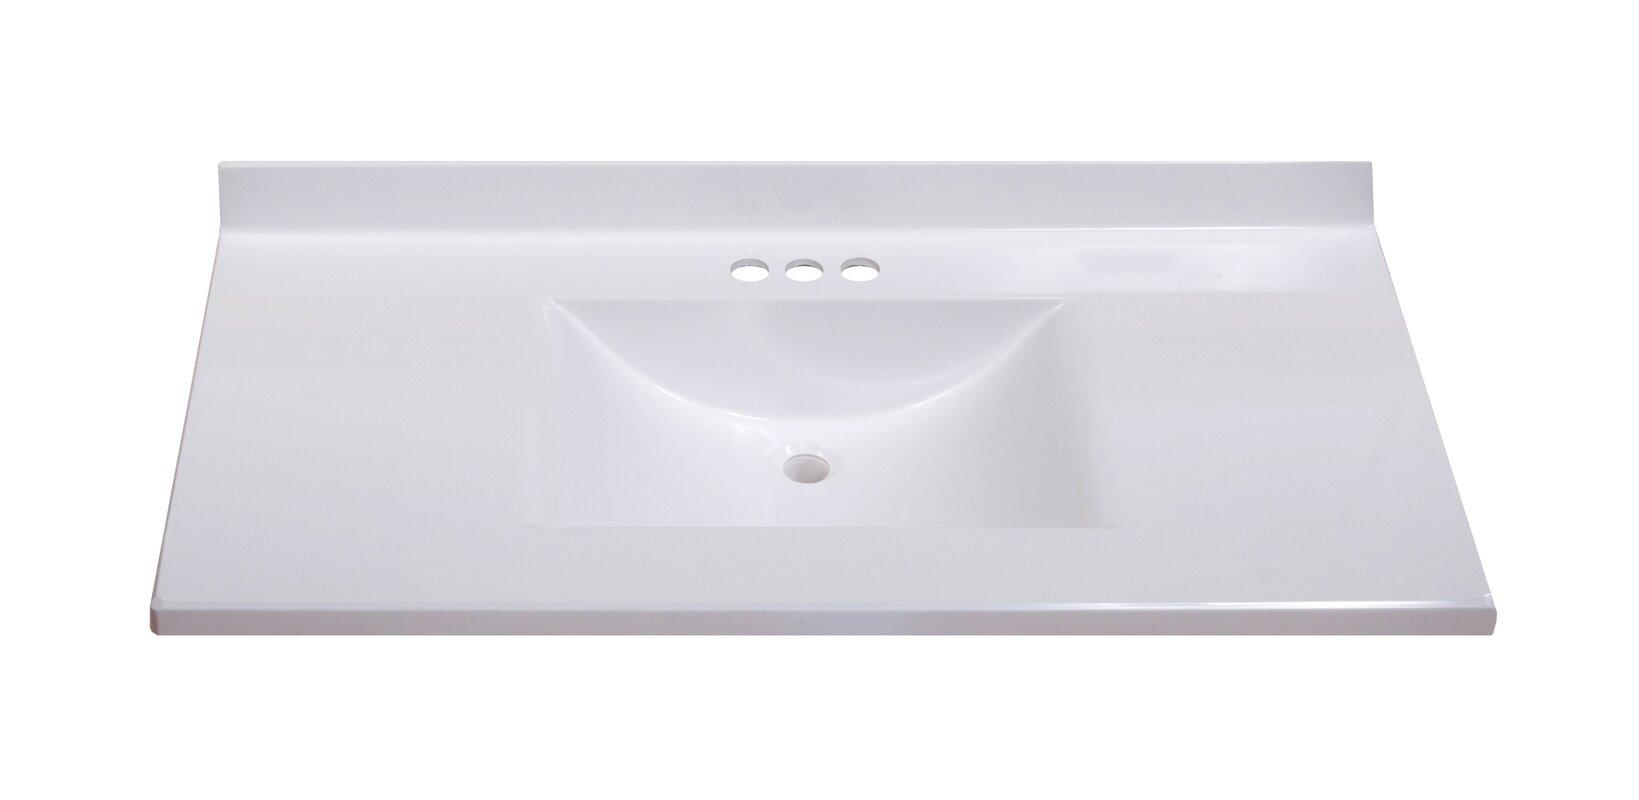 96 Inch Double Sink Vanity Top DESIGN ELEMENT Washington 96